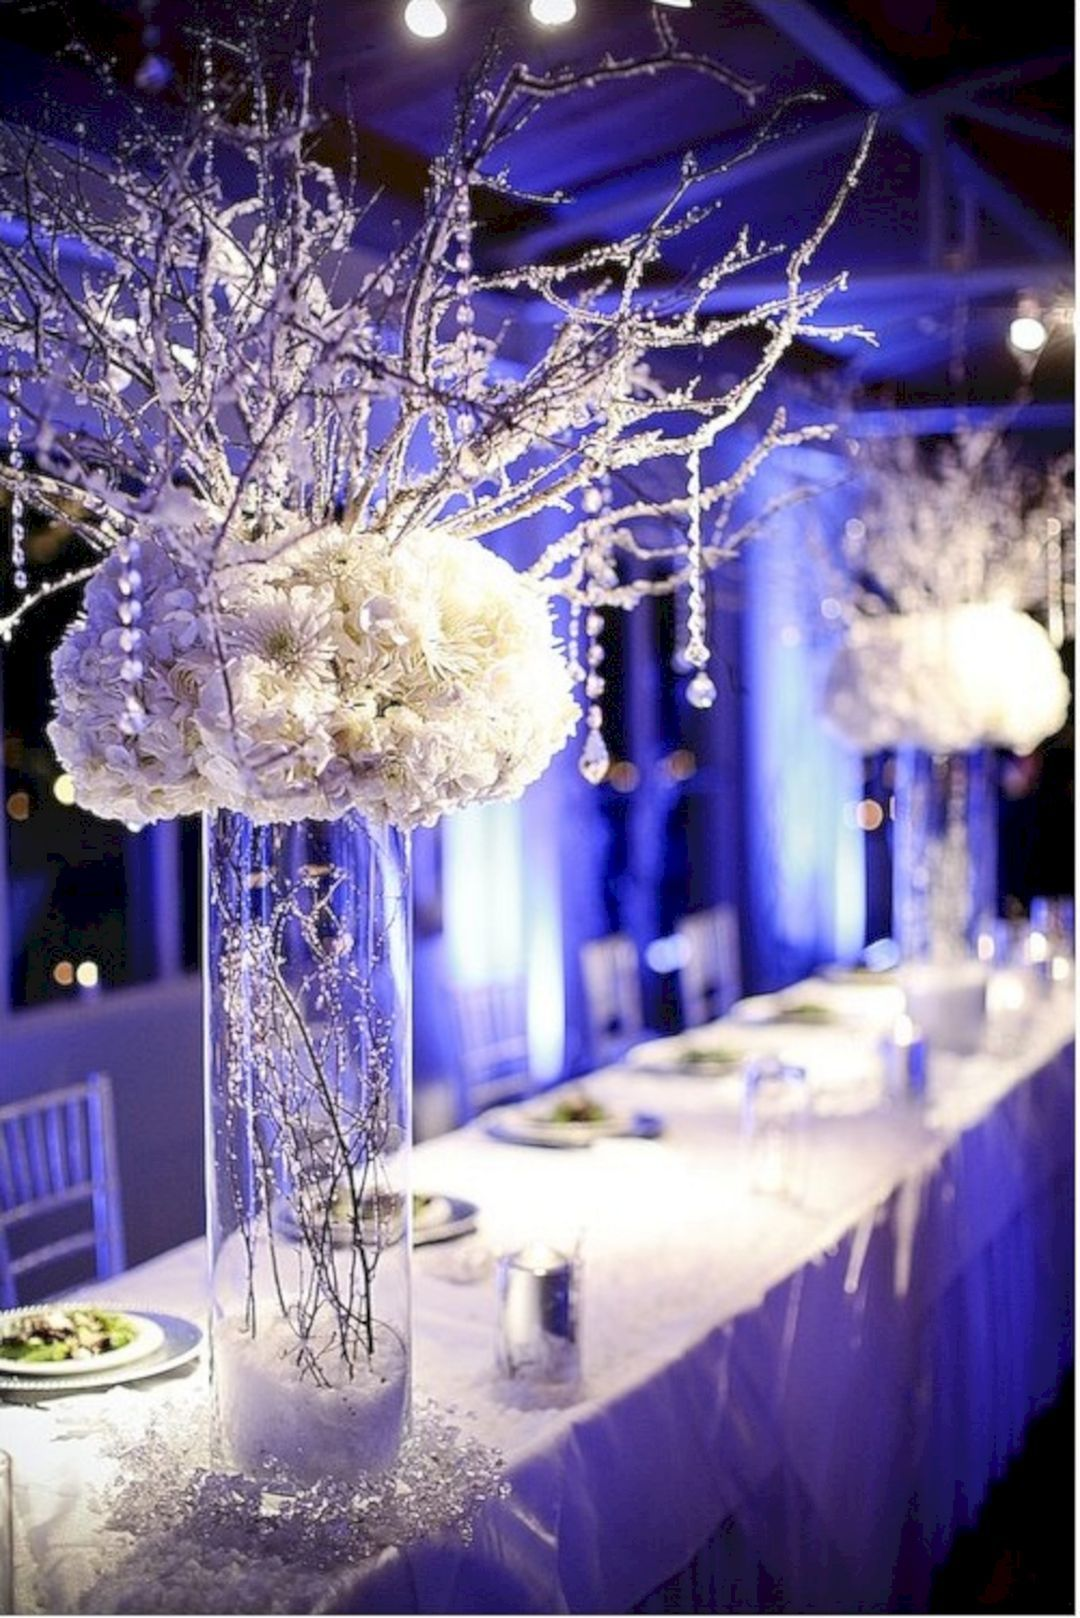 8 Cozy Scandinavian Wedding Ideas For Winter Wedding Wonderland Wedding Decorations Winter Wonderland Wedding Decorations Winter Wonderland Wedding Centerpieces